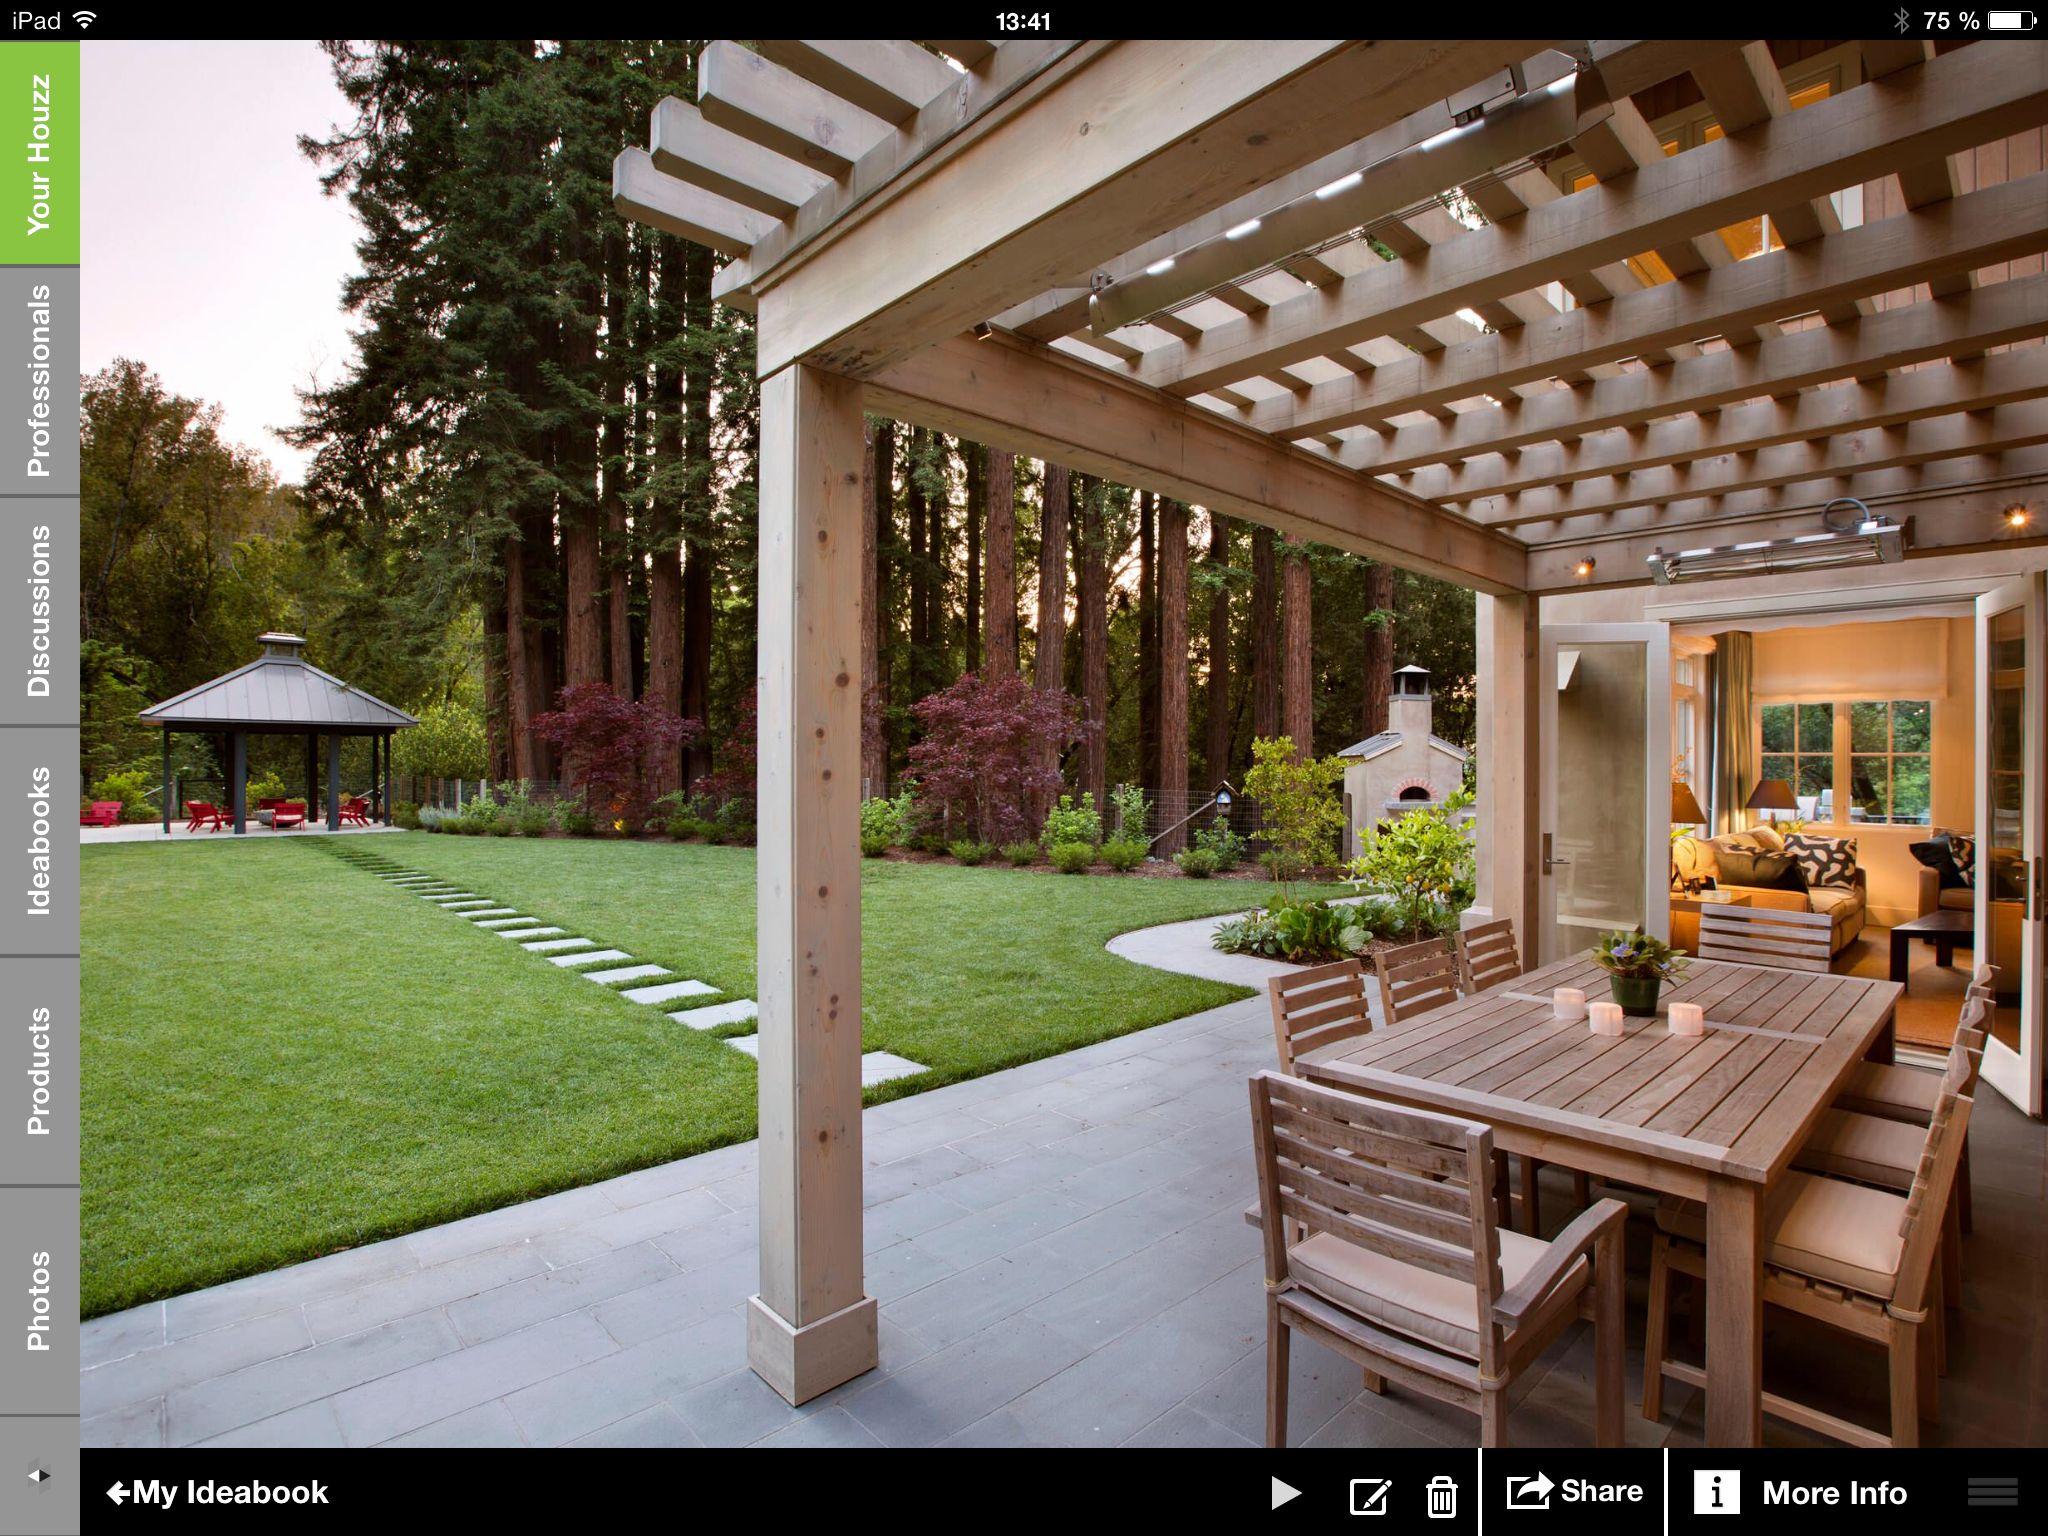 Schöne Gartenmöbel | Garten | Pinterest | Gartenmoebel, Garten ...